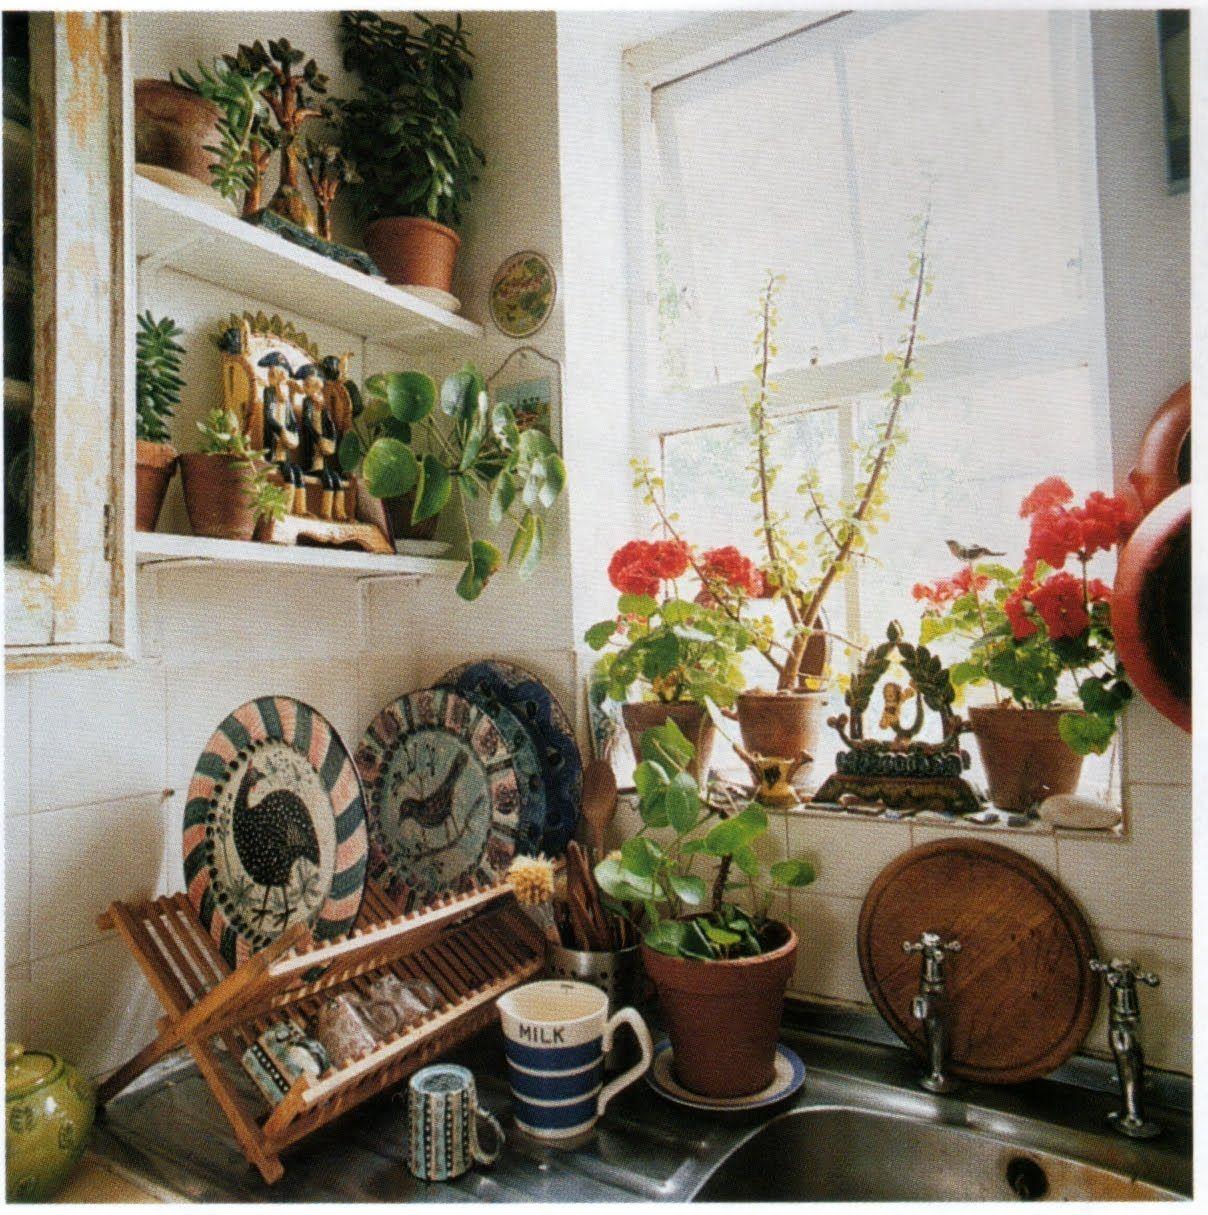 genus loci: a cheerful corner at the Yorkshire flat of British artist-designer Mark Hearld. World of Interiors, Nov 07